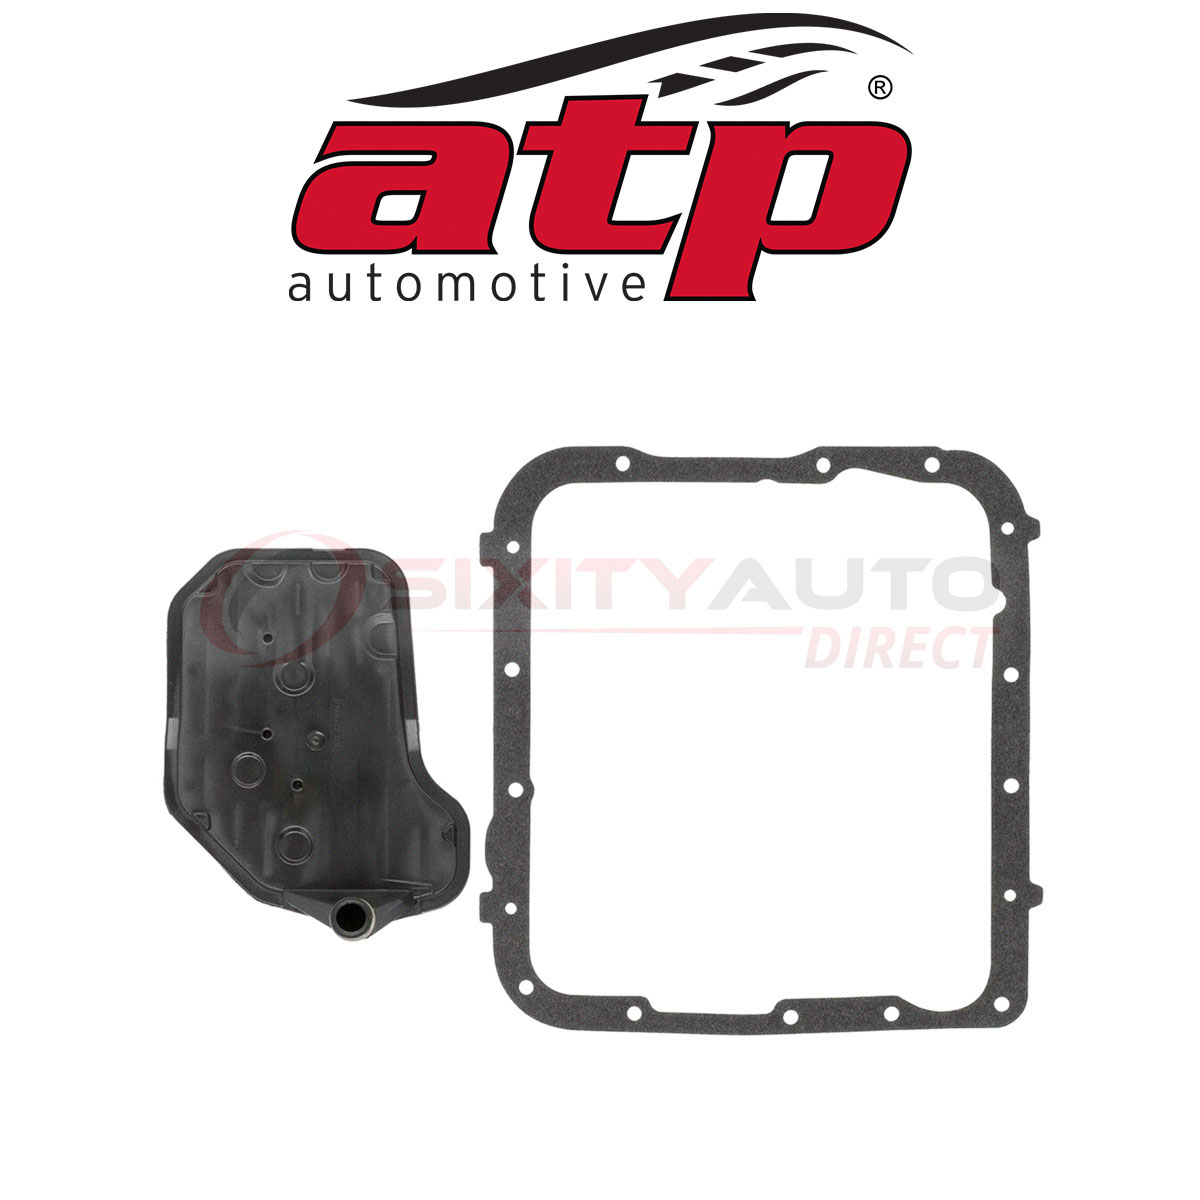 ATP Automotive Auto Transmission Filter Kit for 2010-2015 Chevrolet Camaro me